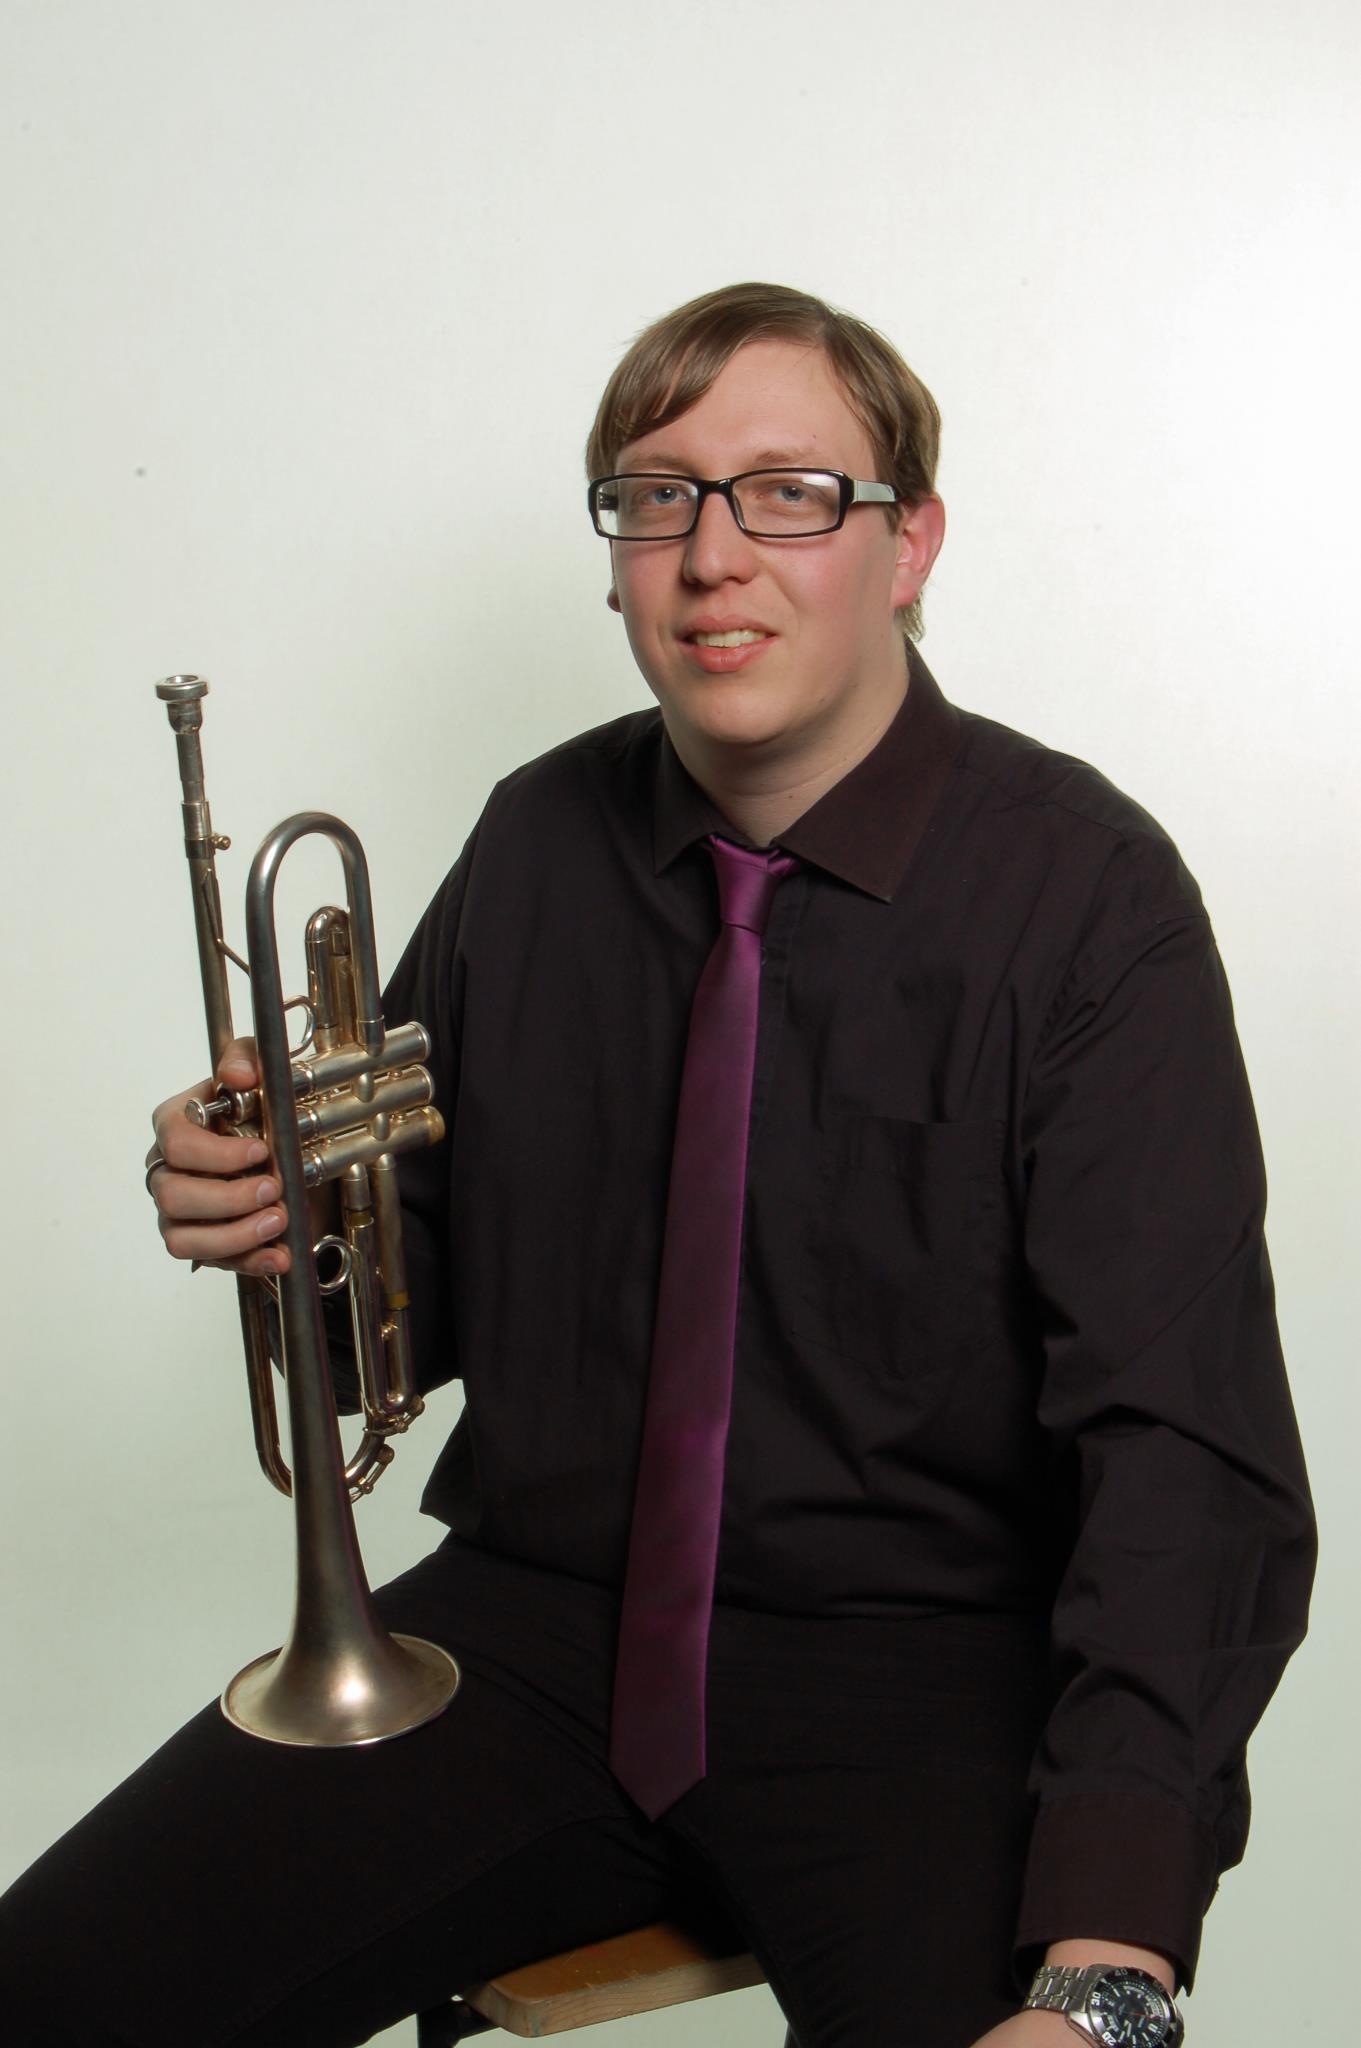 - nick - trumpet/flugelhorn